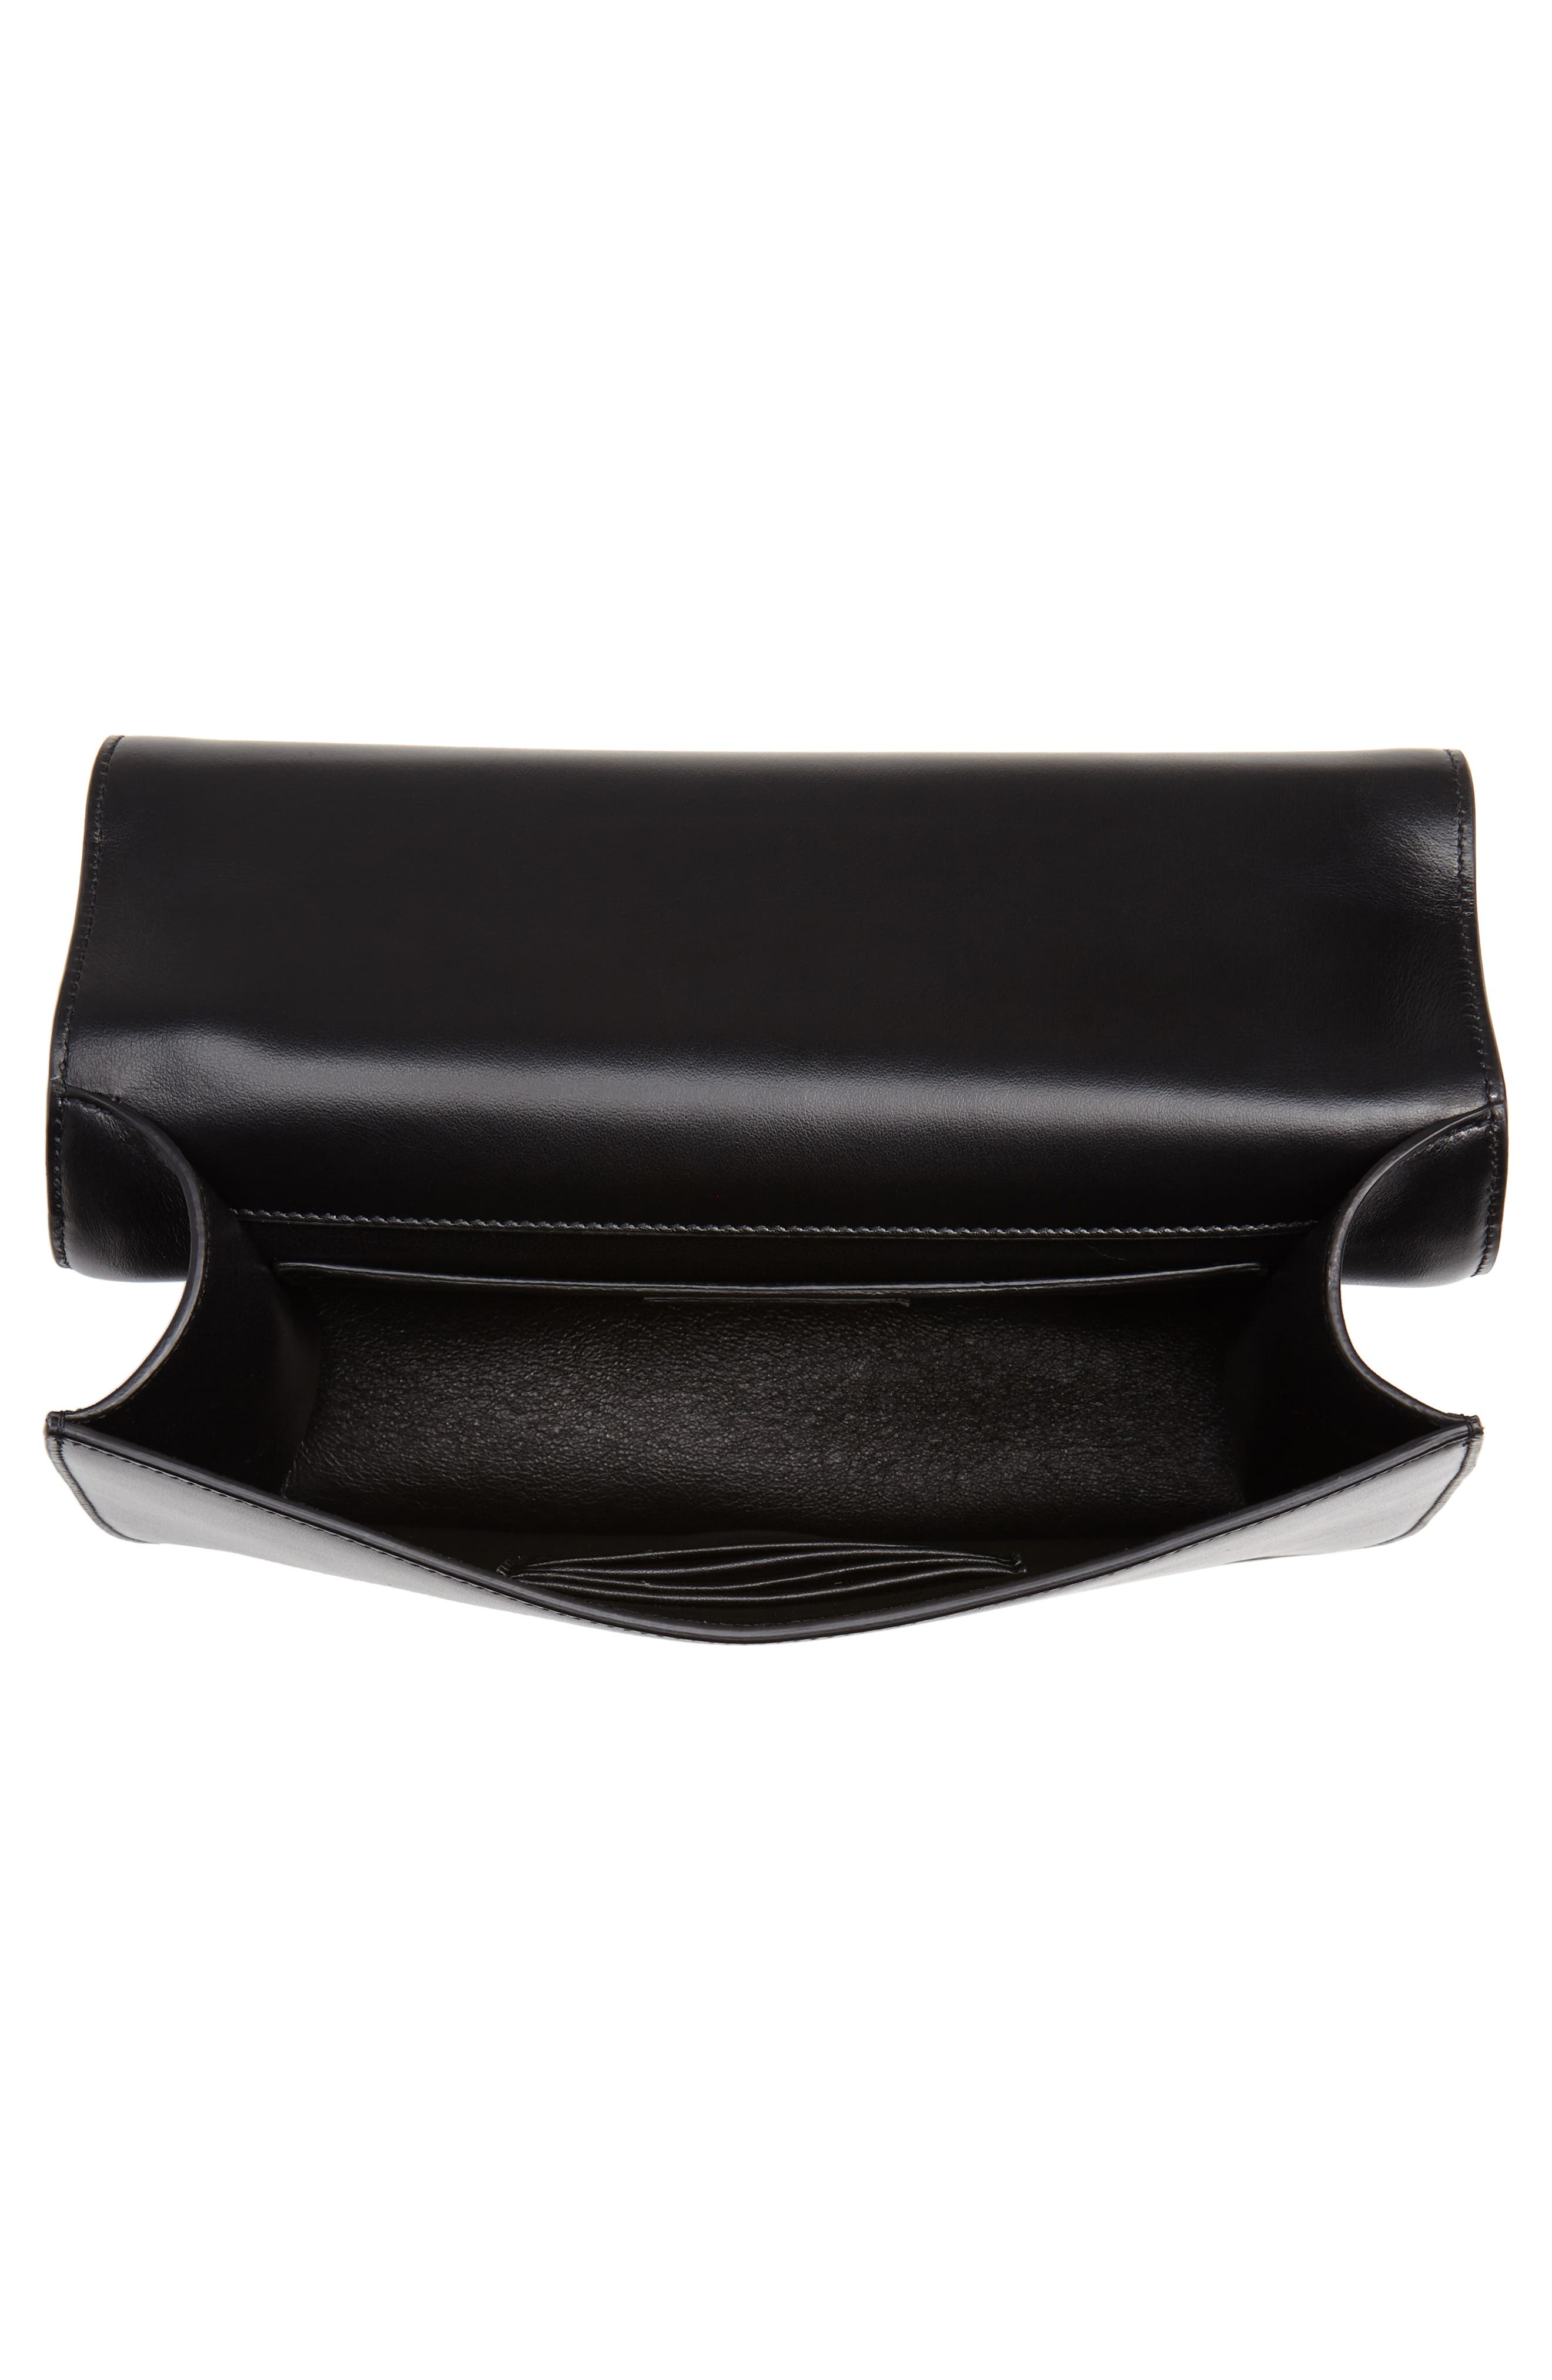 Medium Spontini Leather Shoulder Bag,                             Alternate thumbnail 4, color,                             NERO